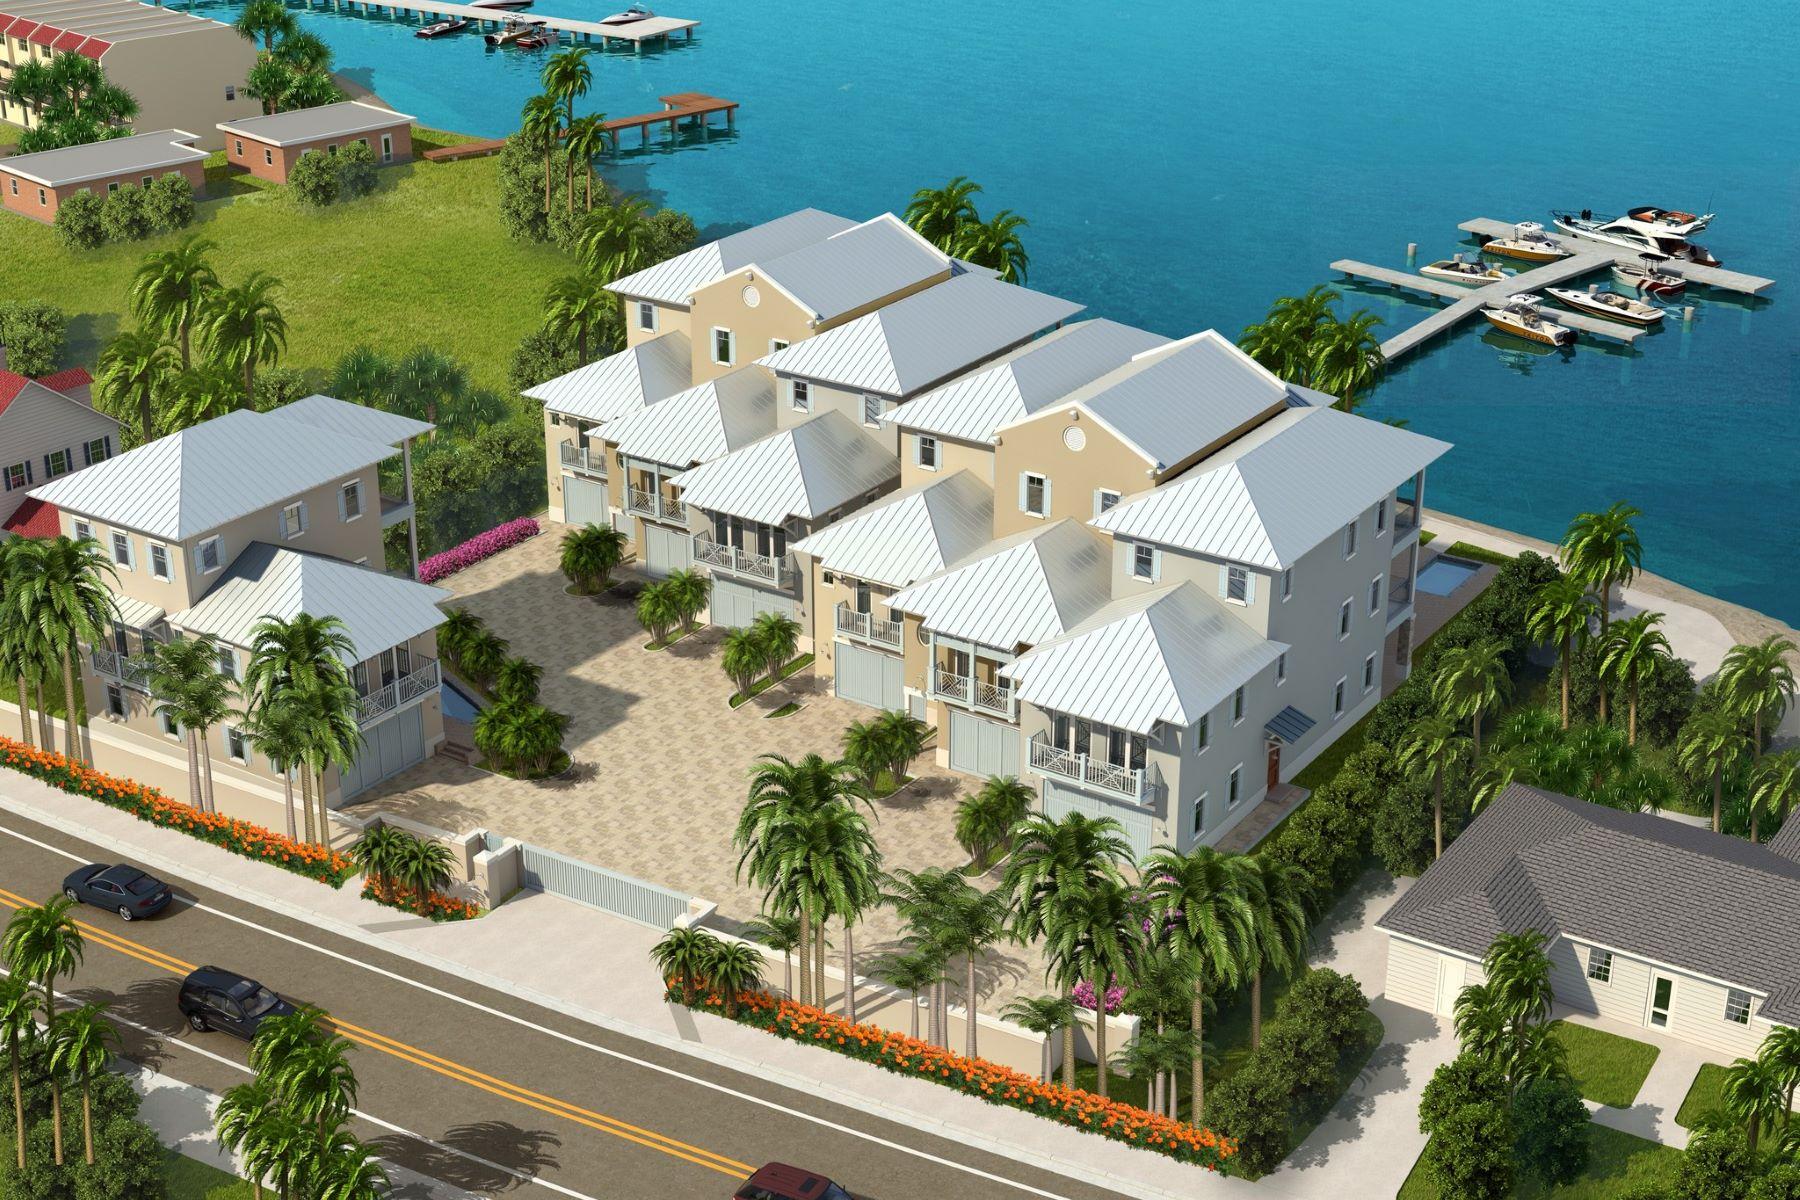 Moradia em banda para Venda às Riverfront Ultra-luxury townhome 1502 Seaway Drive #3 Hutchinson Island, Florida, 34949 Estados Unidos